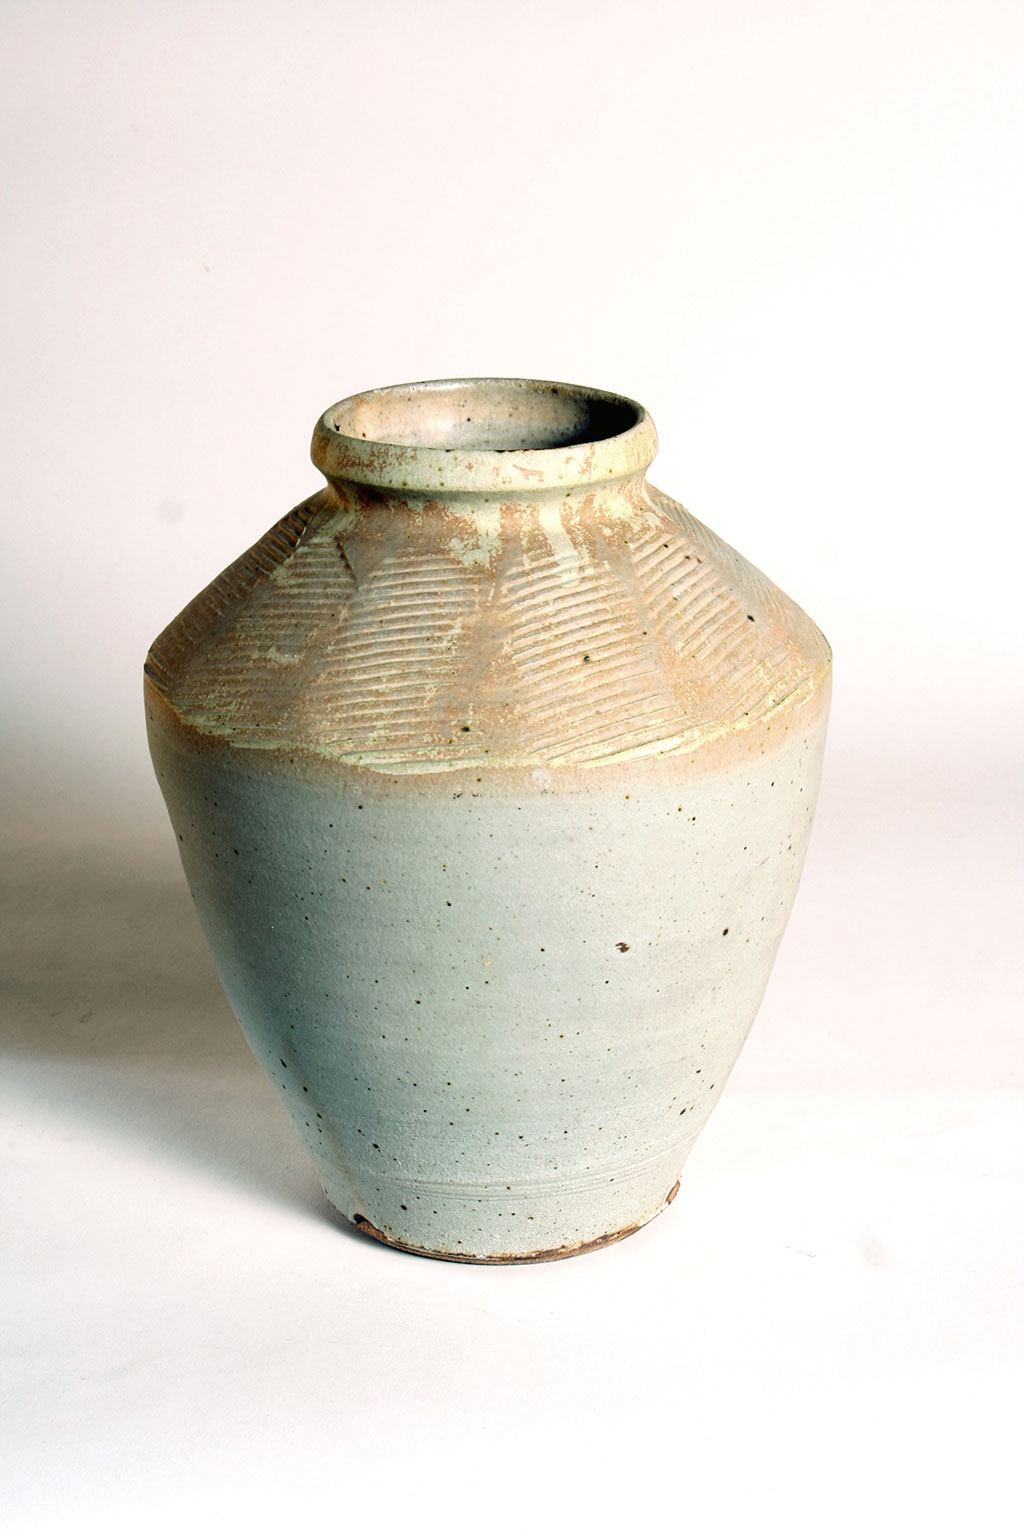 Warren MacKenzie, Vase. Lauren Jordan photograph